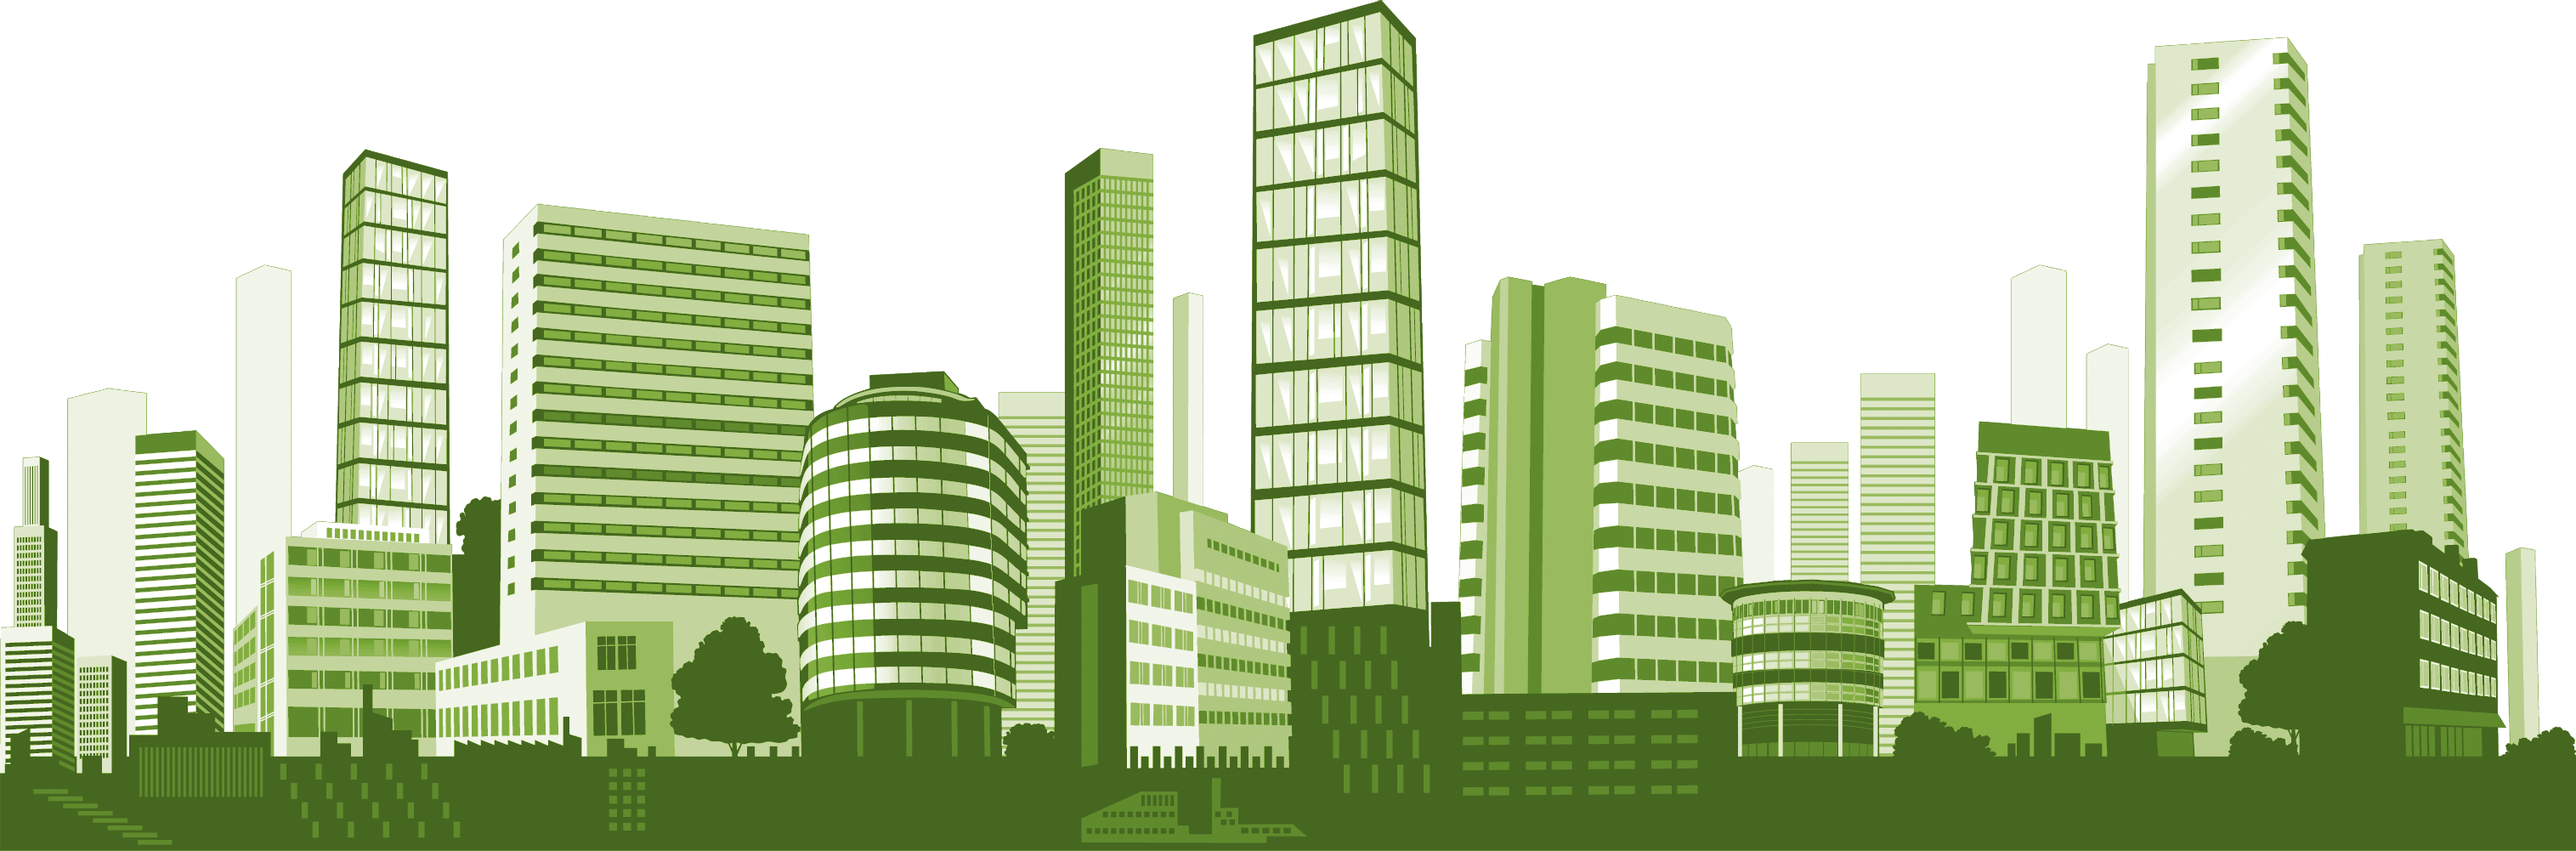 Greener Building Driverlayer Search Engine